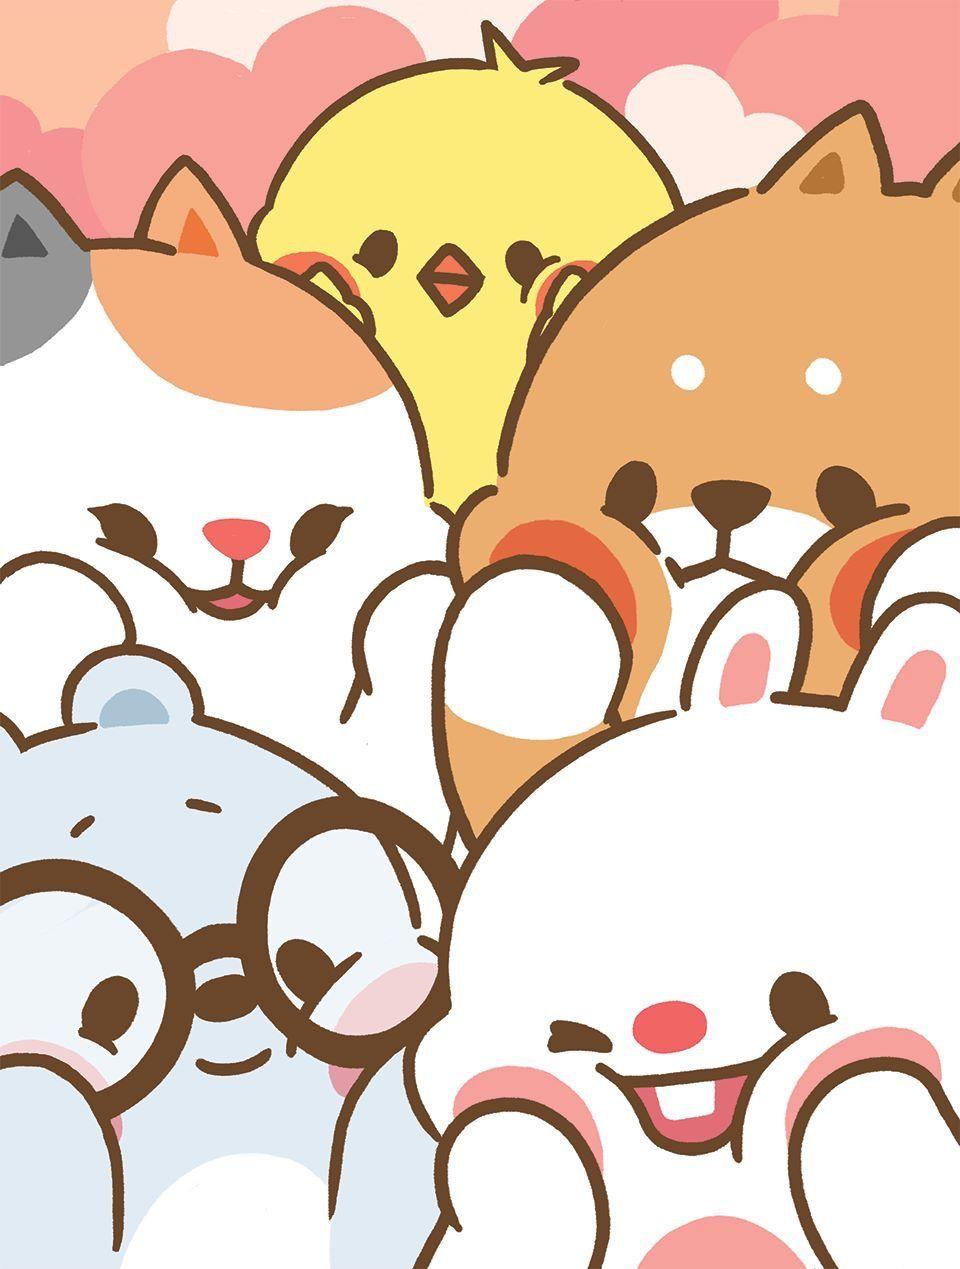 Pin By Lisa Jo On Tonton Cute Cartoon Wallpapers Kawaii Wallpaper Cartoon Wallpaper